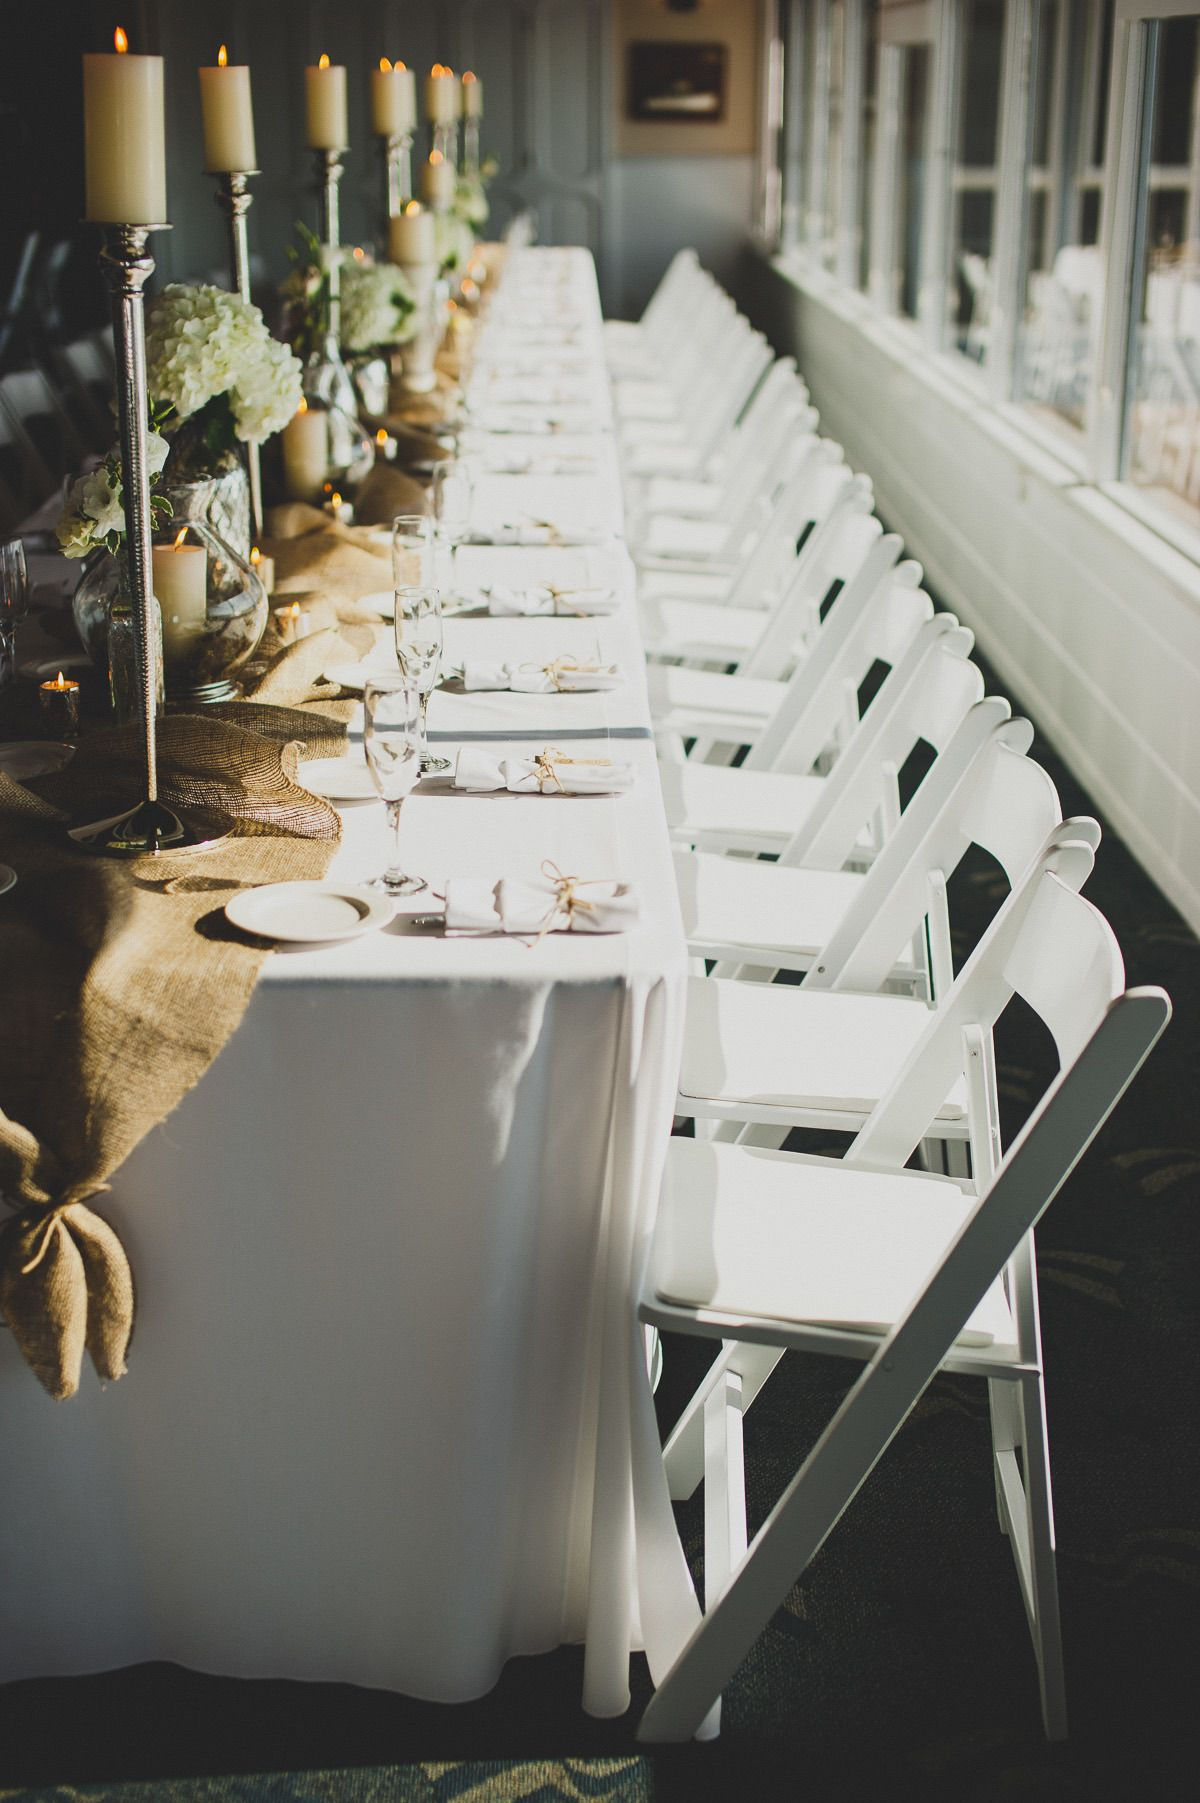 Yacht wedding decorations  Shabby Chic Balboa Yacht Club Wedding  Wedding That is NEVER going